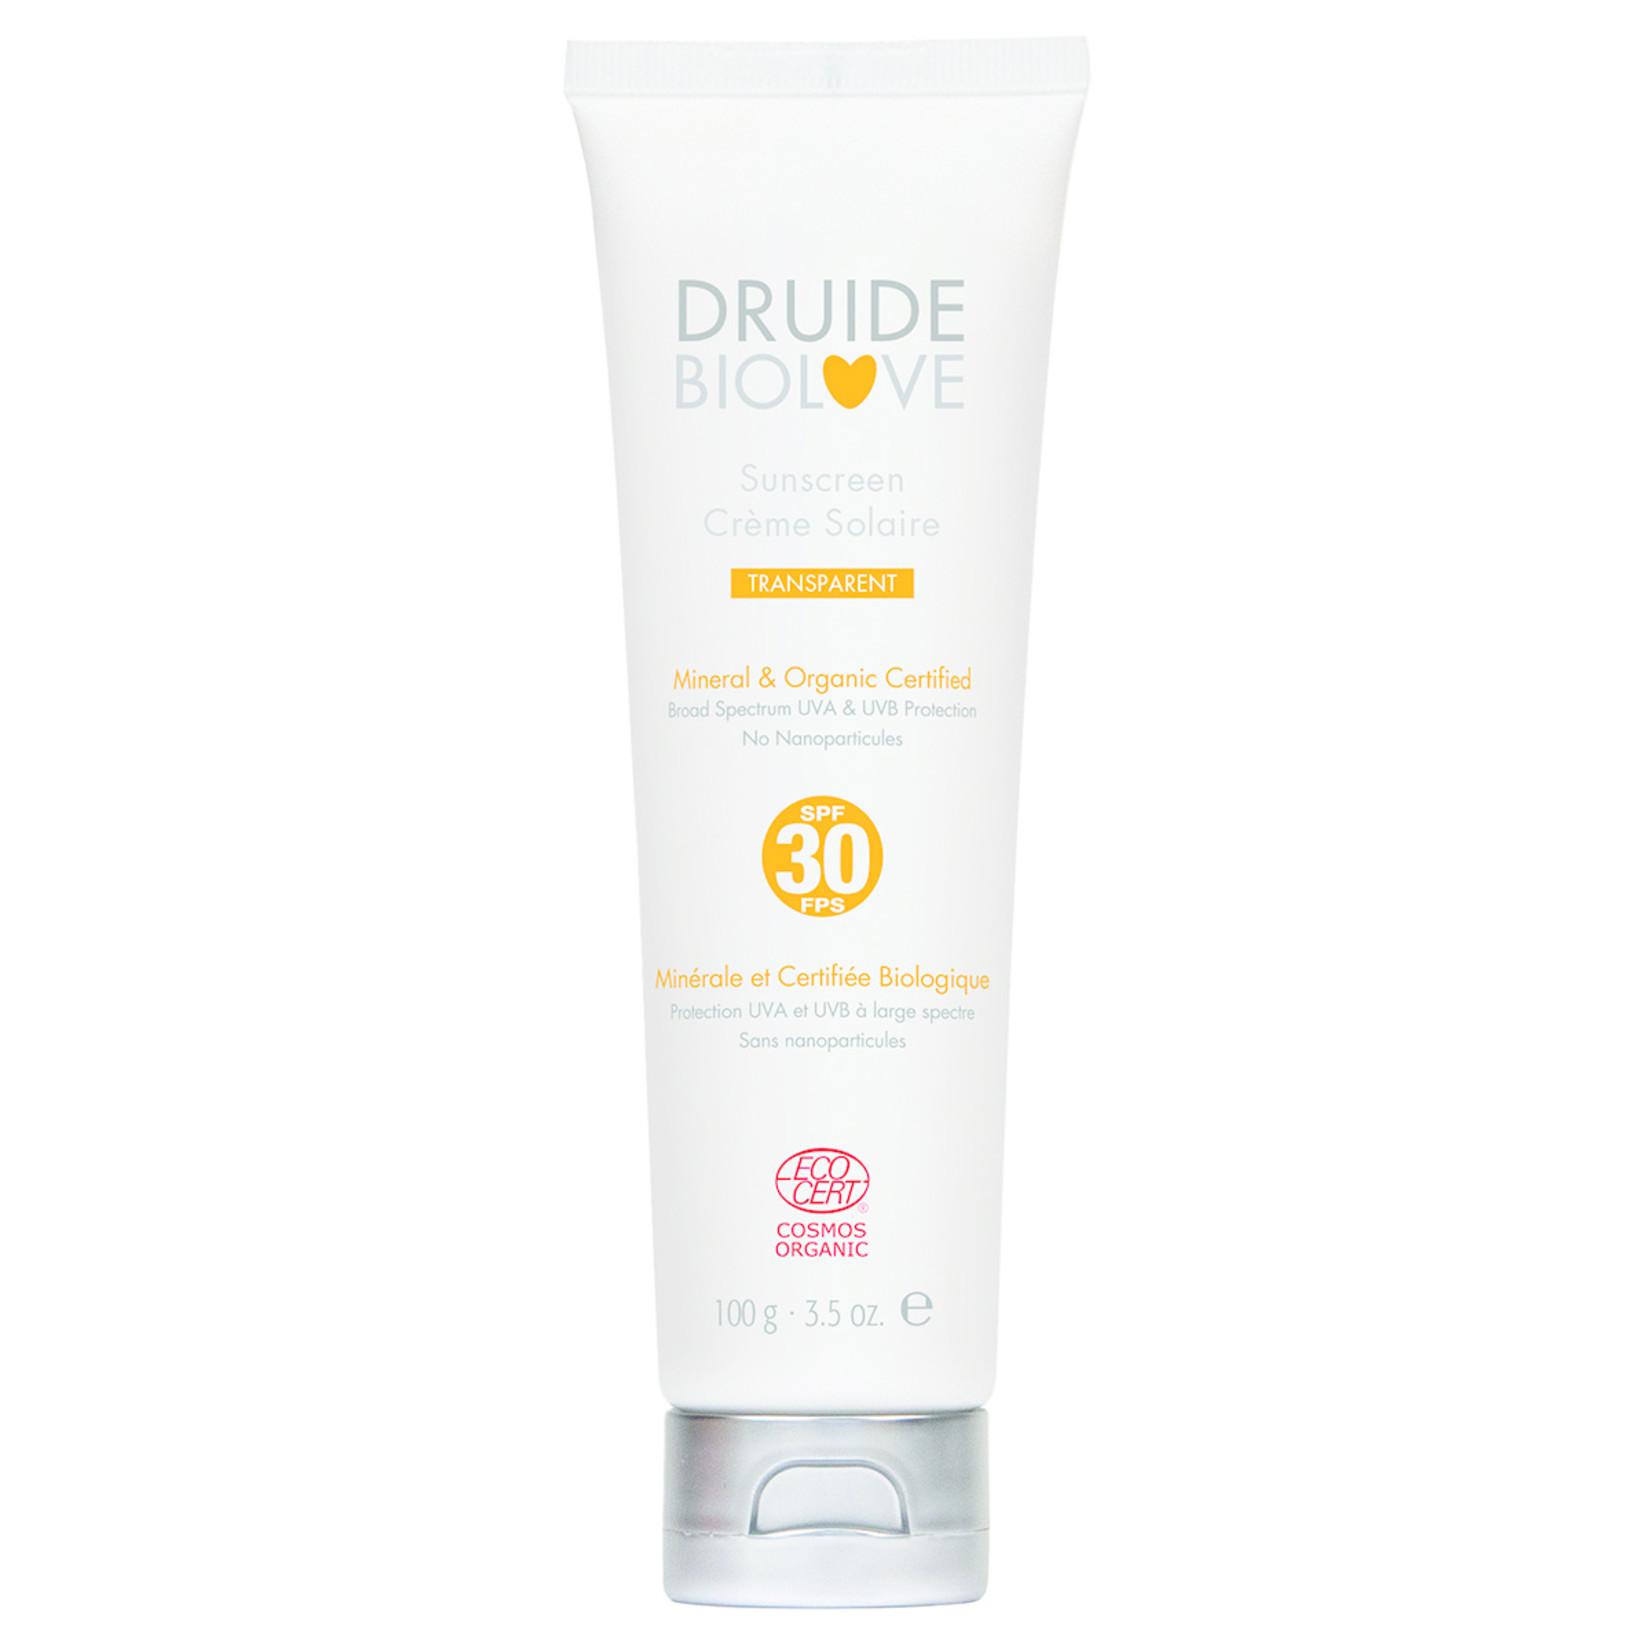 Druide Sunscreen  SPF-30